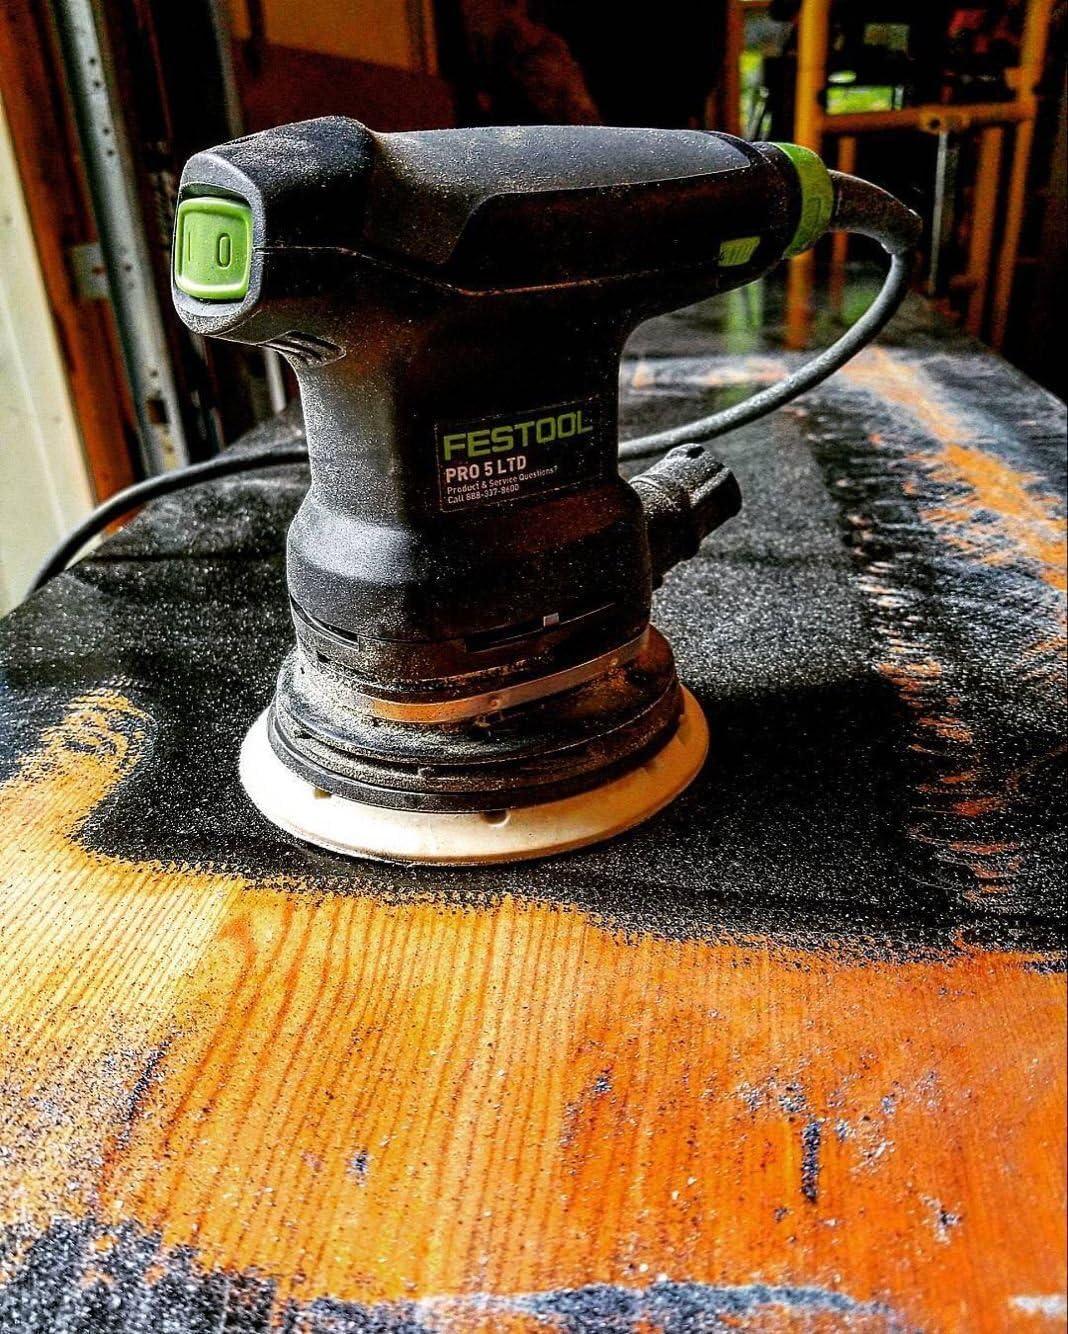 TigerShark 5 Inch Sanding Discs 9 Hole Wet Dry Grit 800//1200//1500//2000 20pcs Pack Special Anti Clog Coating Film Green Line Hook and Loop Dustless Random Orbital Sander Paper Super Fine